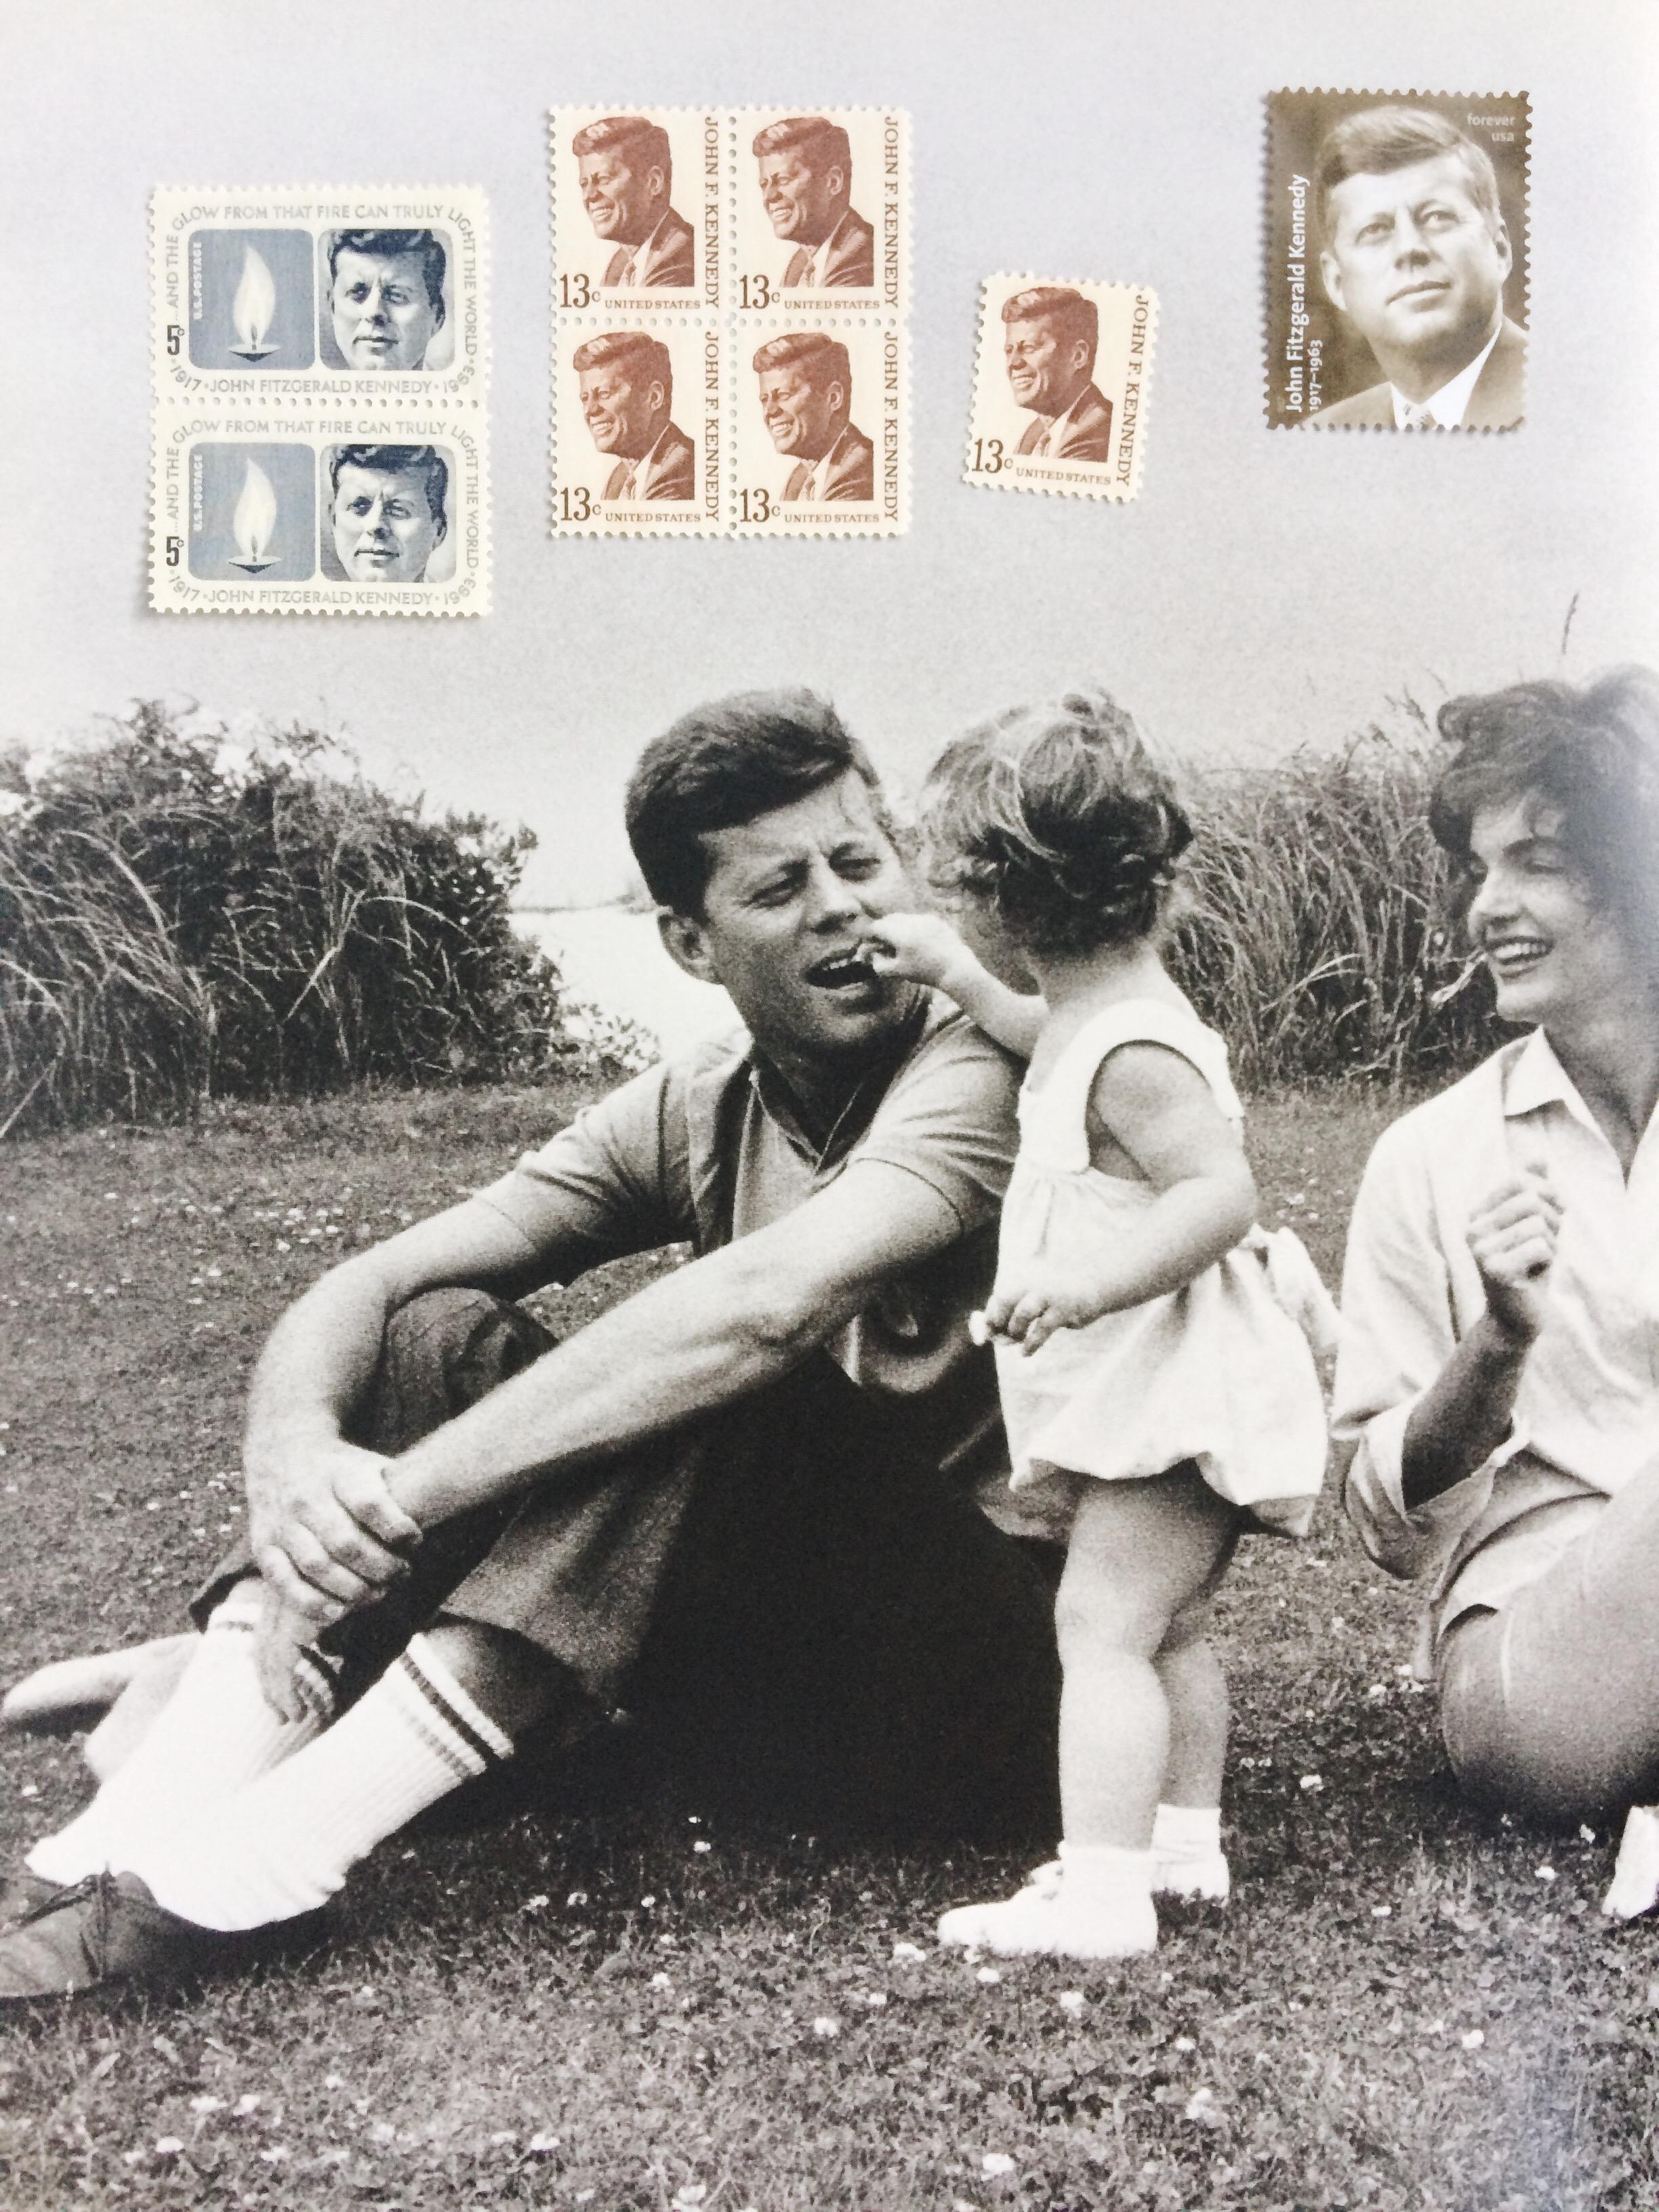 JFK Postage Stamps / Paper & Type